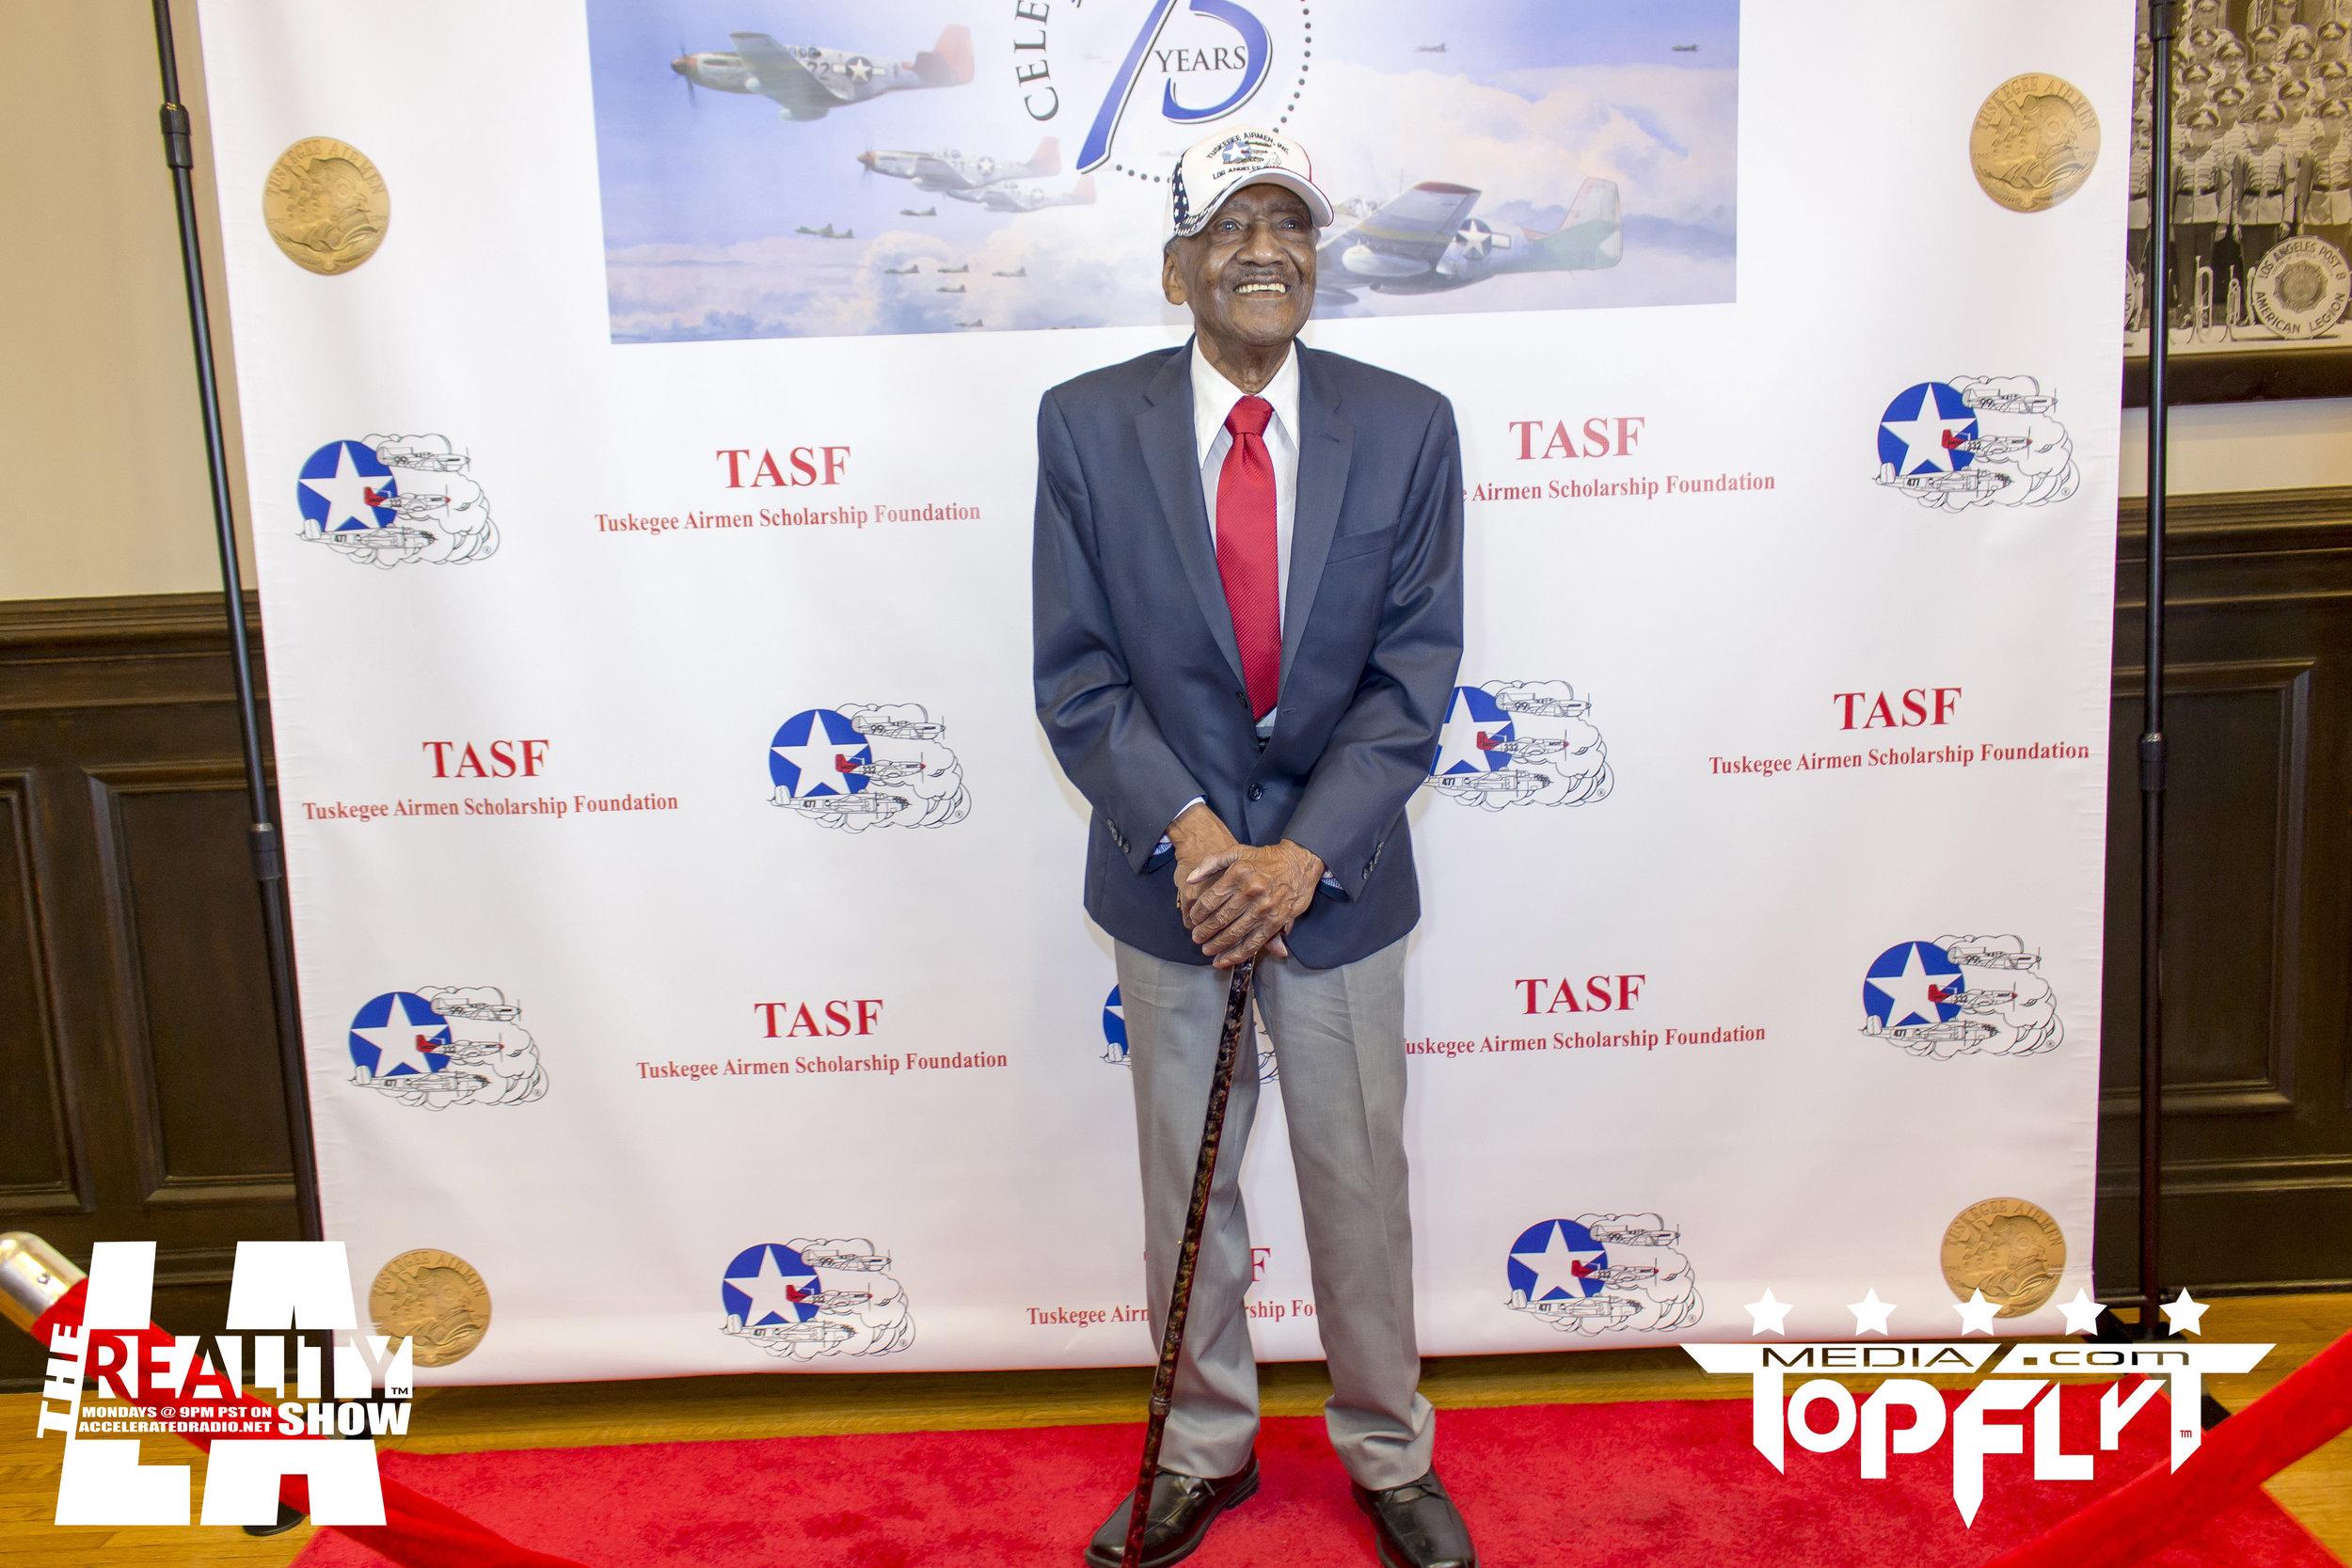 The Reality Show LA - Tuskegee Airmen 75th Anniversary VIP Reception_11.jpg